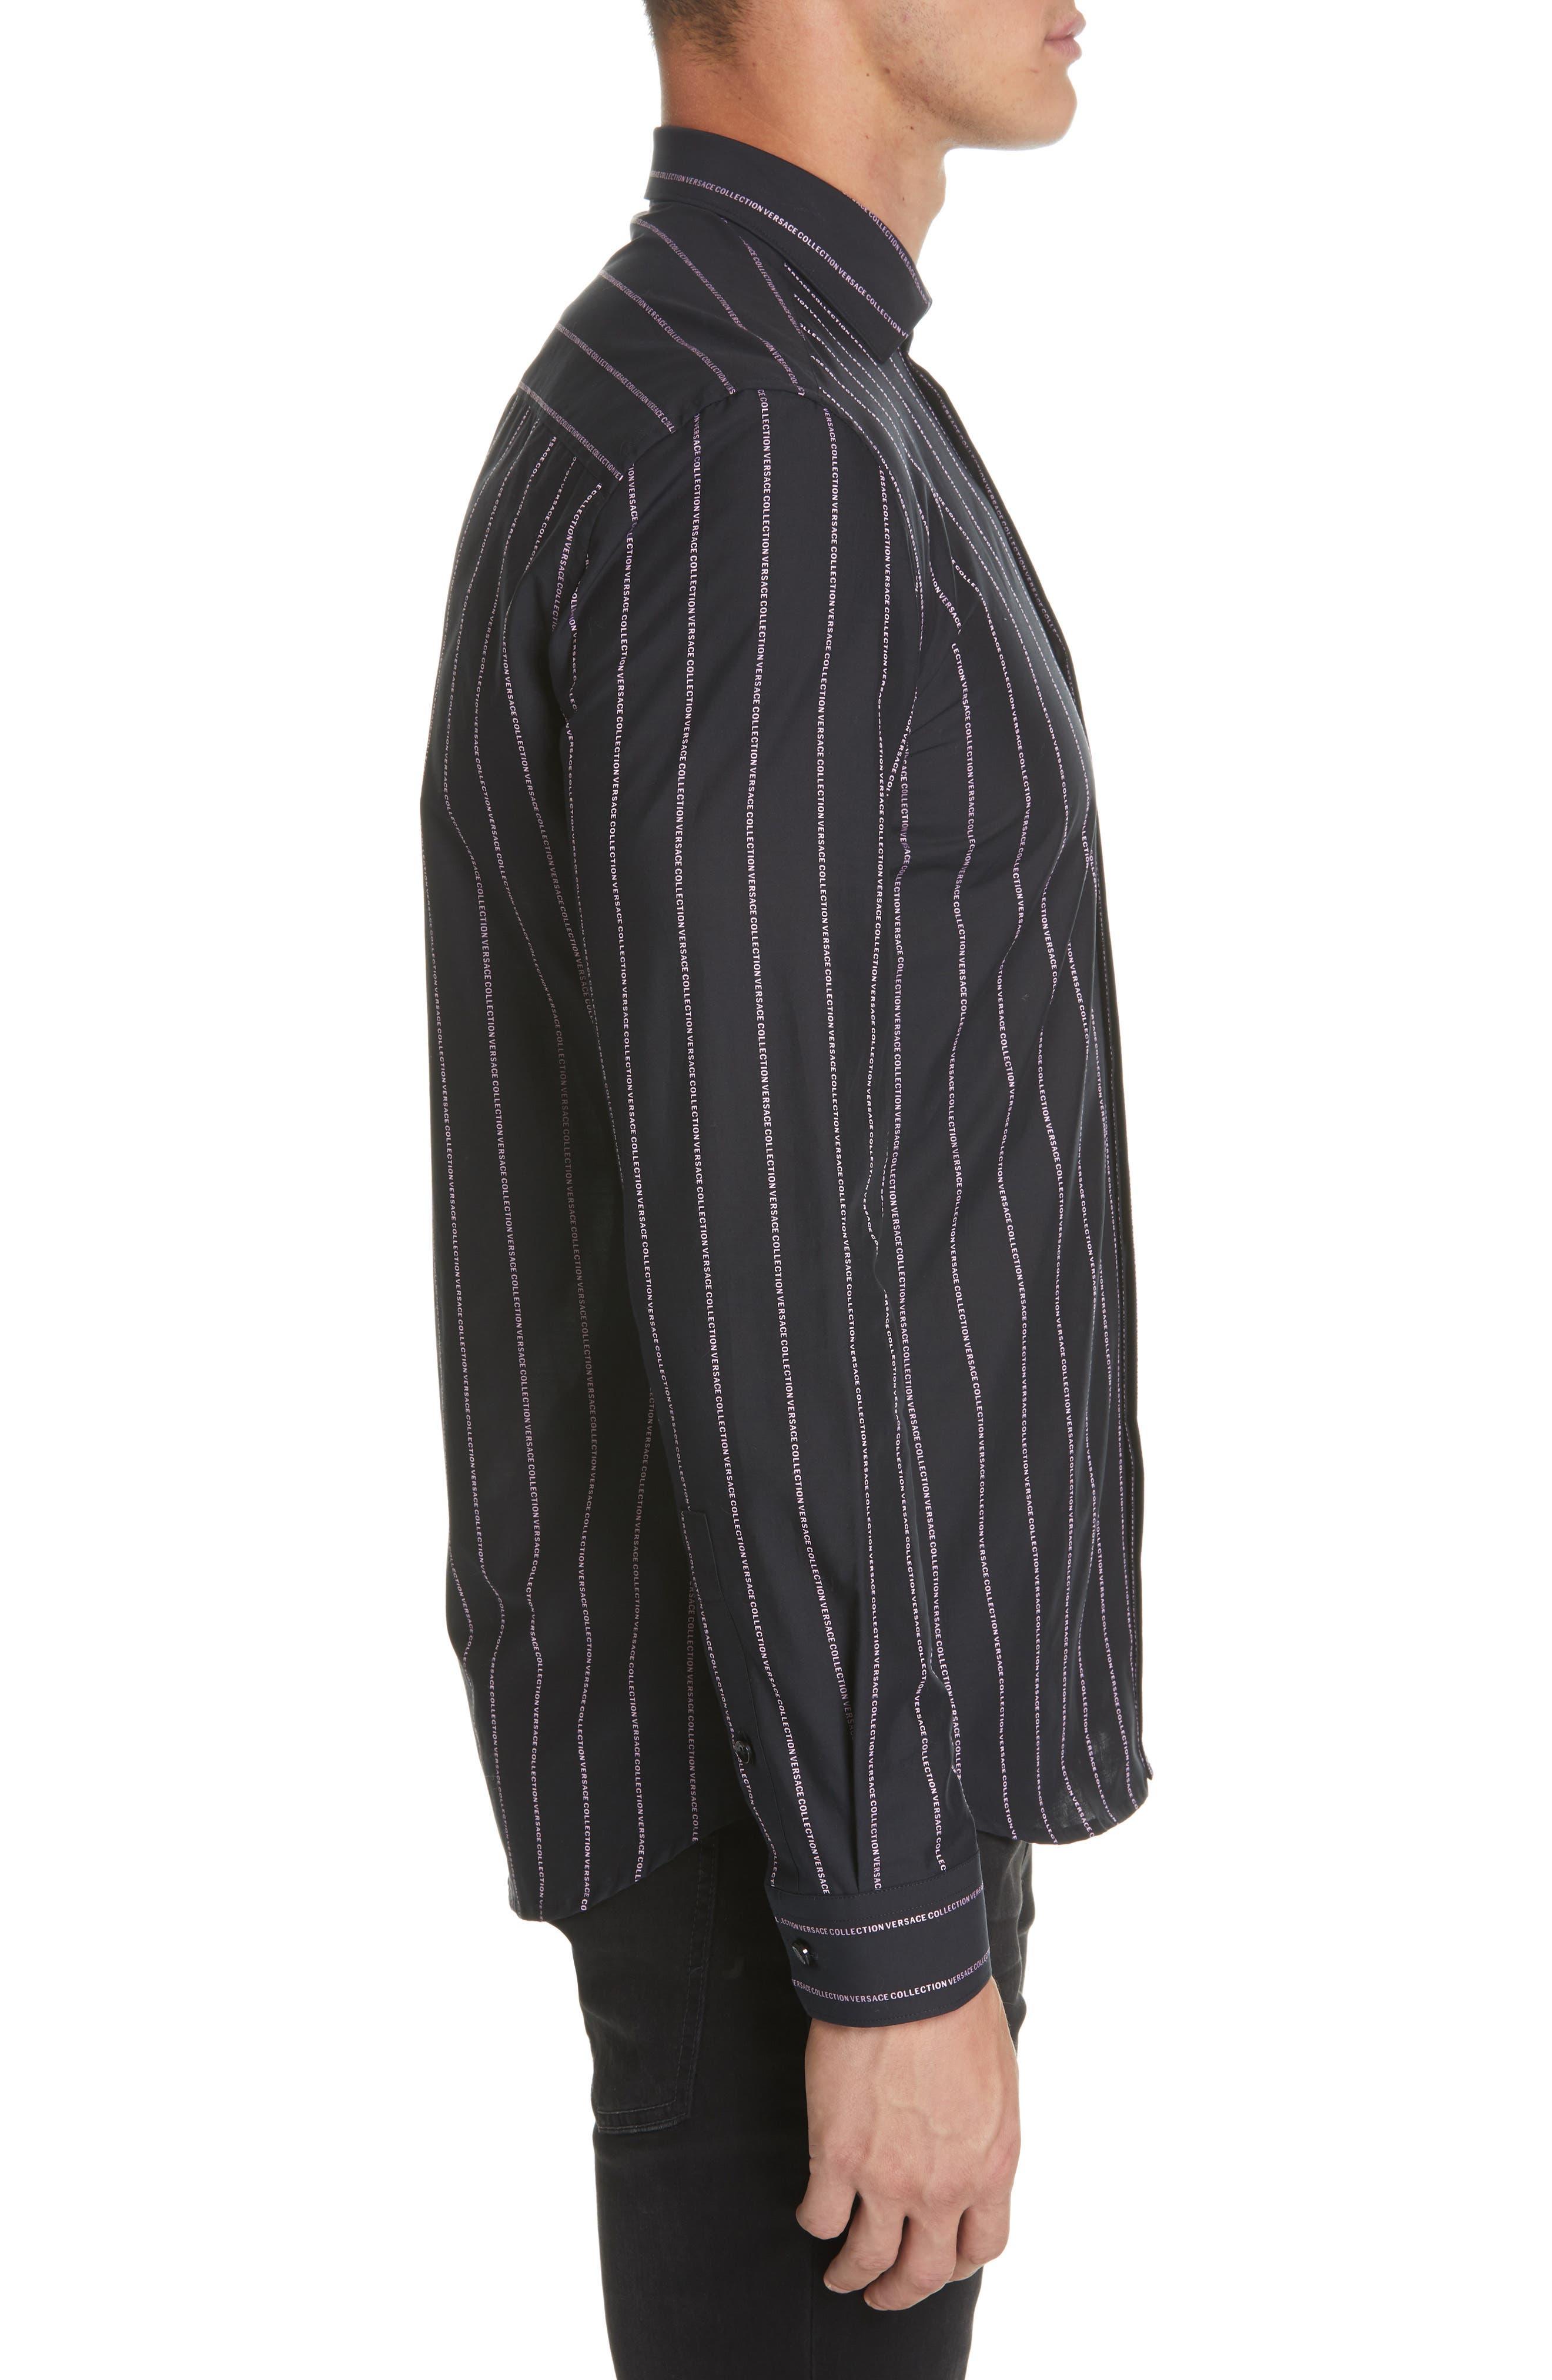 VERSACE COLLECTION, Logo Stripe Sport Shirt, Alternate thumbnail 4, color, BLACK/ PINK